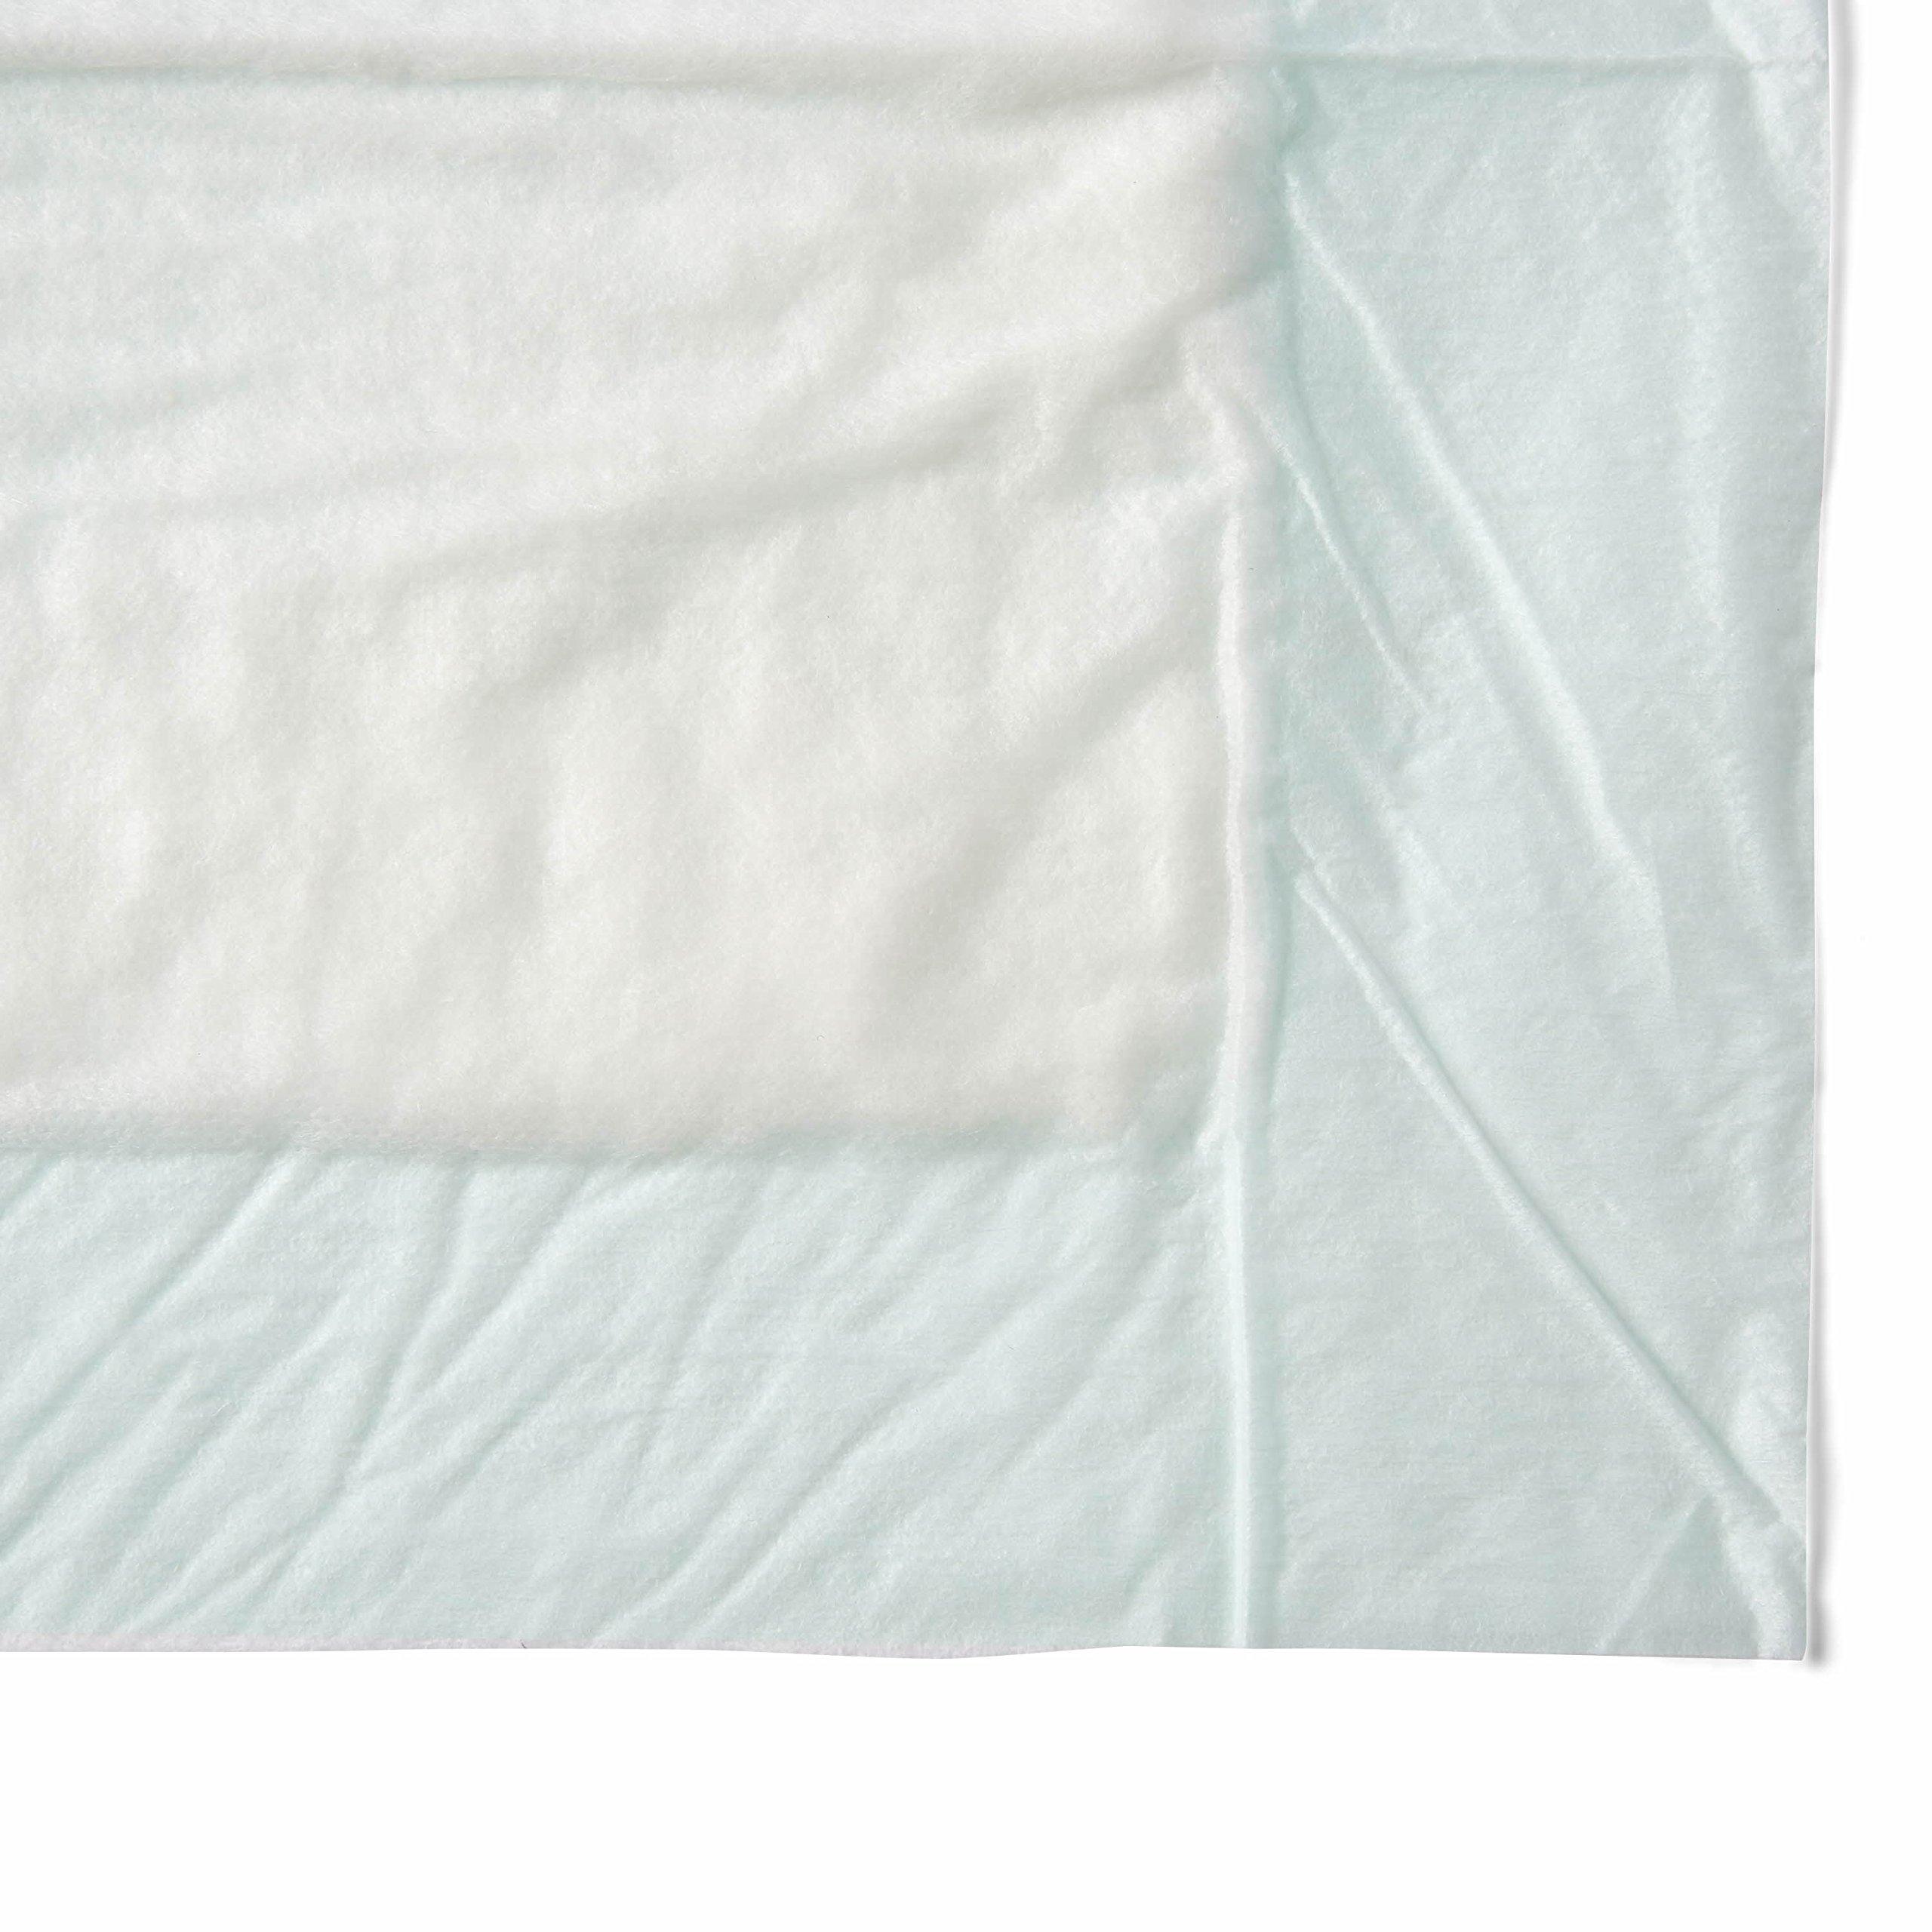 medline deluxe super absorbency underpads 30 x 36 disposable